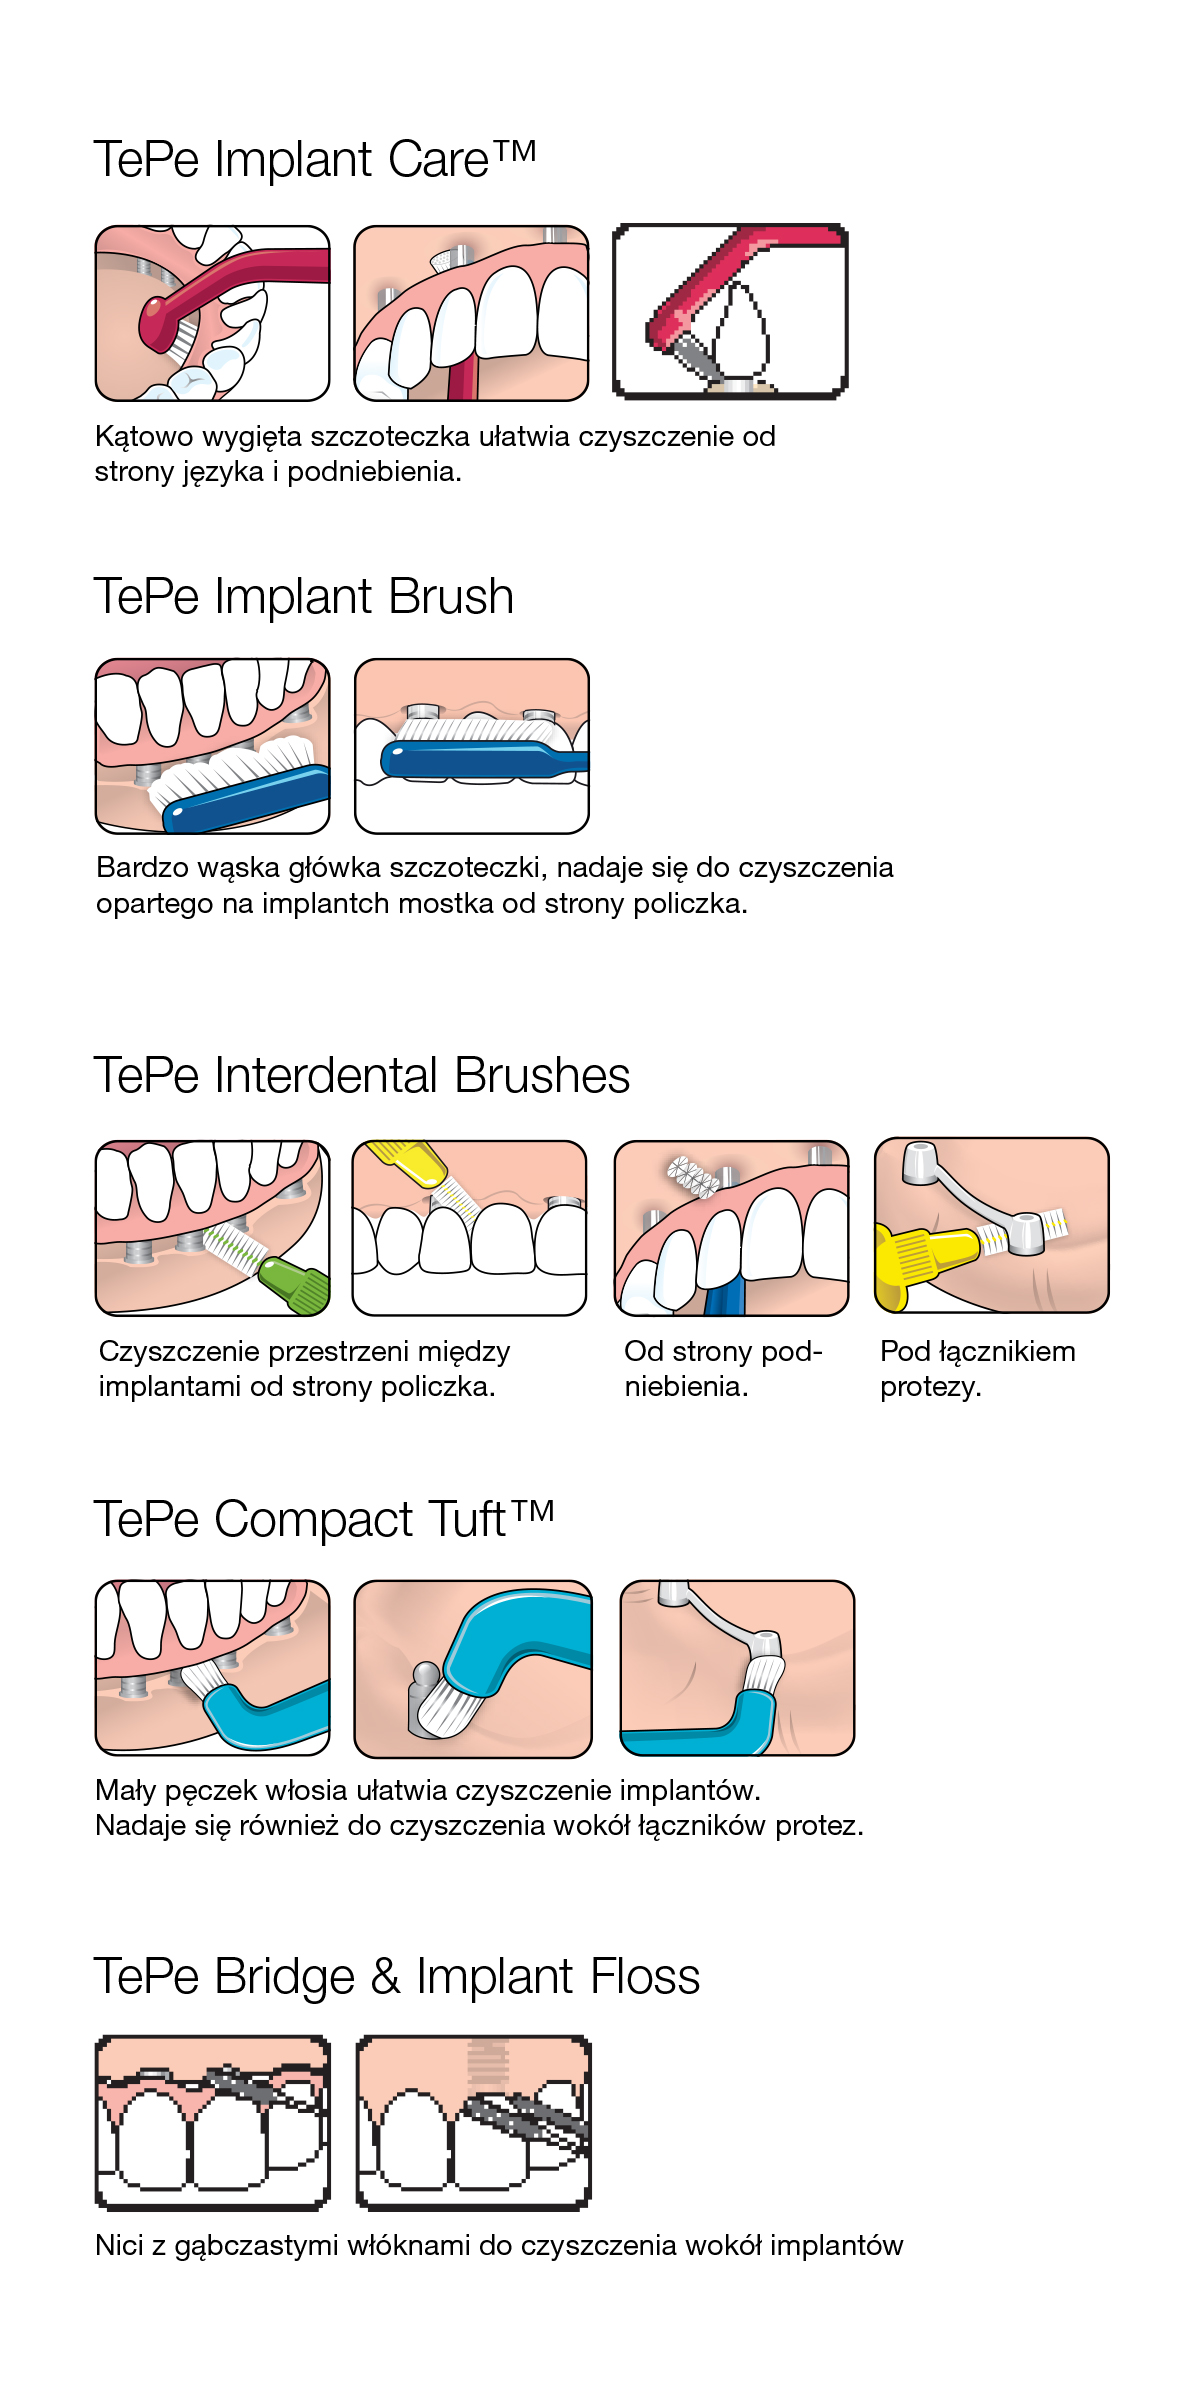 tepe_implant